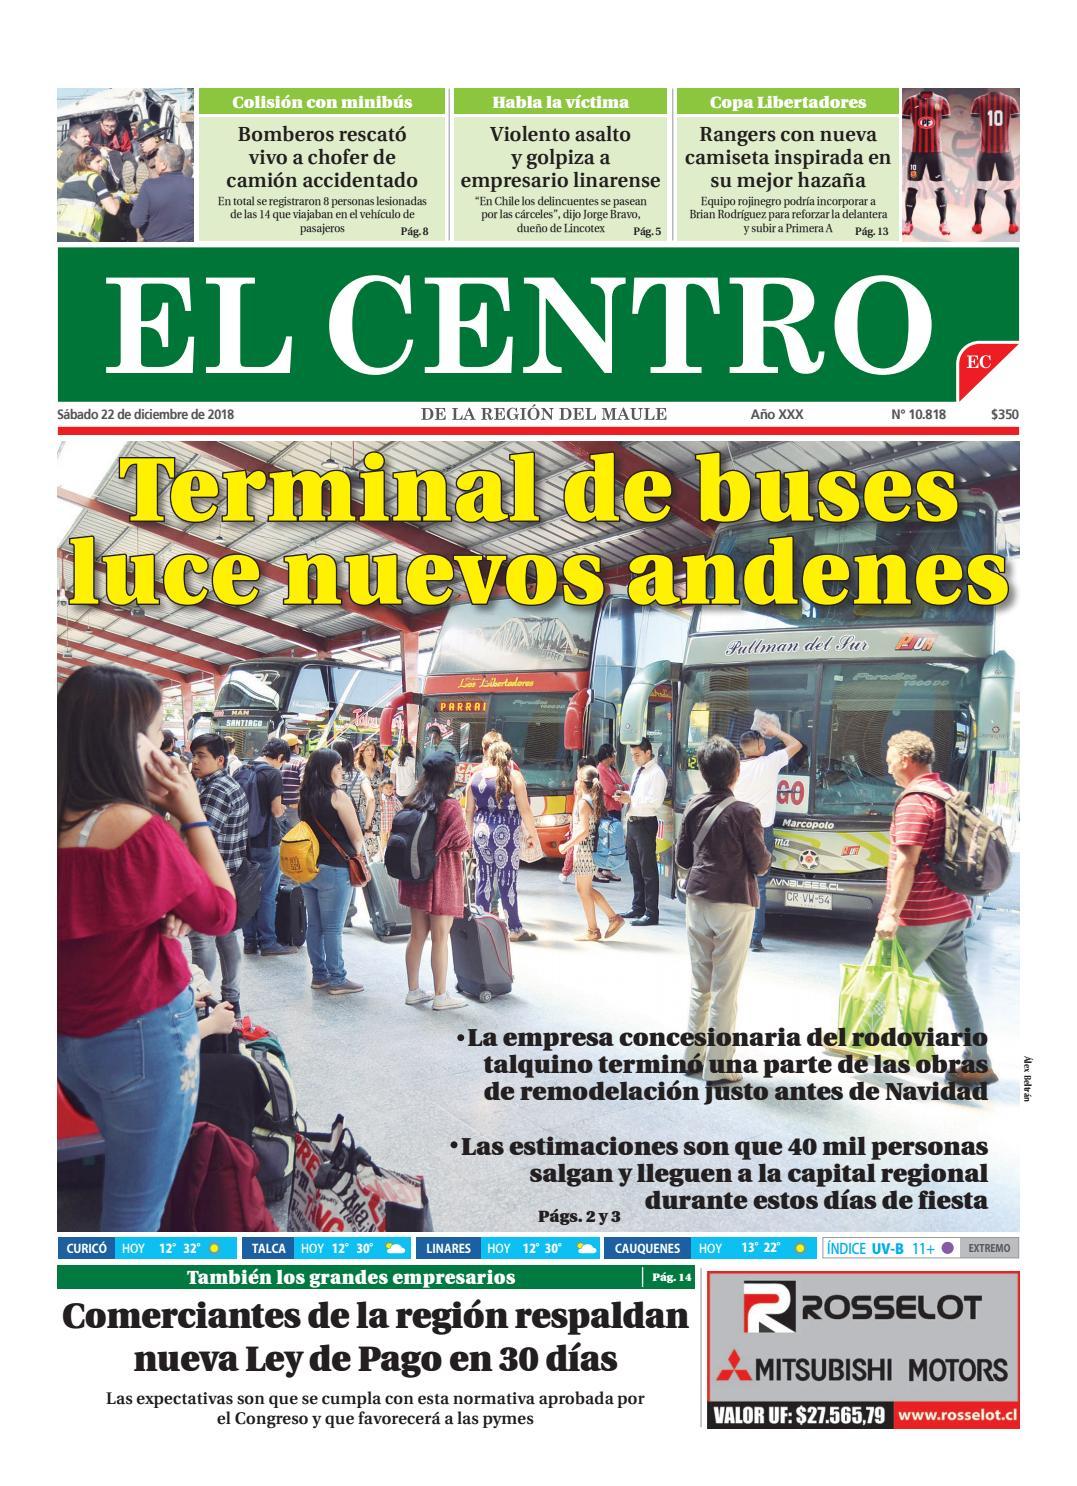 Diario 22-12-2018 by Diario El Centro S.A - issuu 43c7309046169